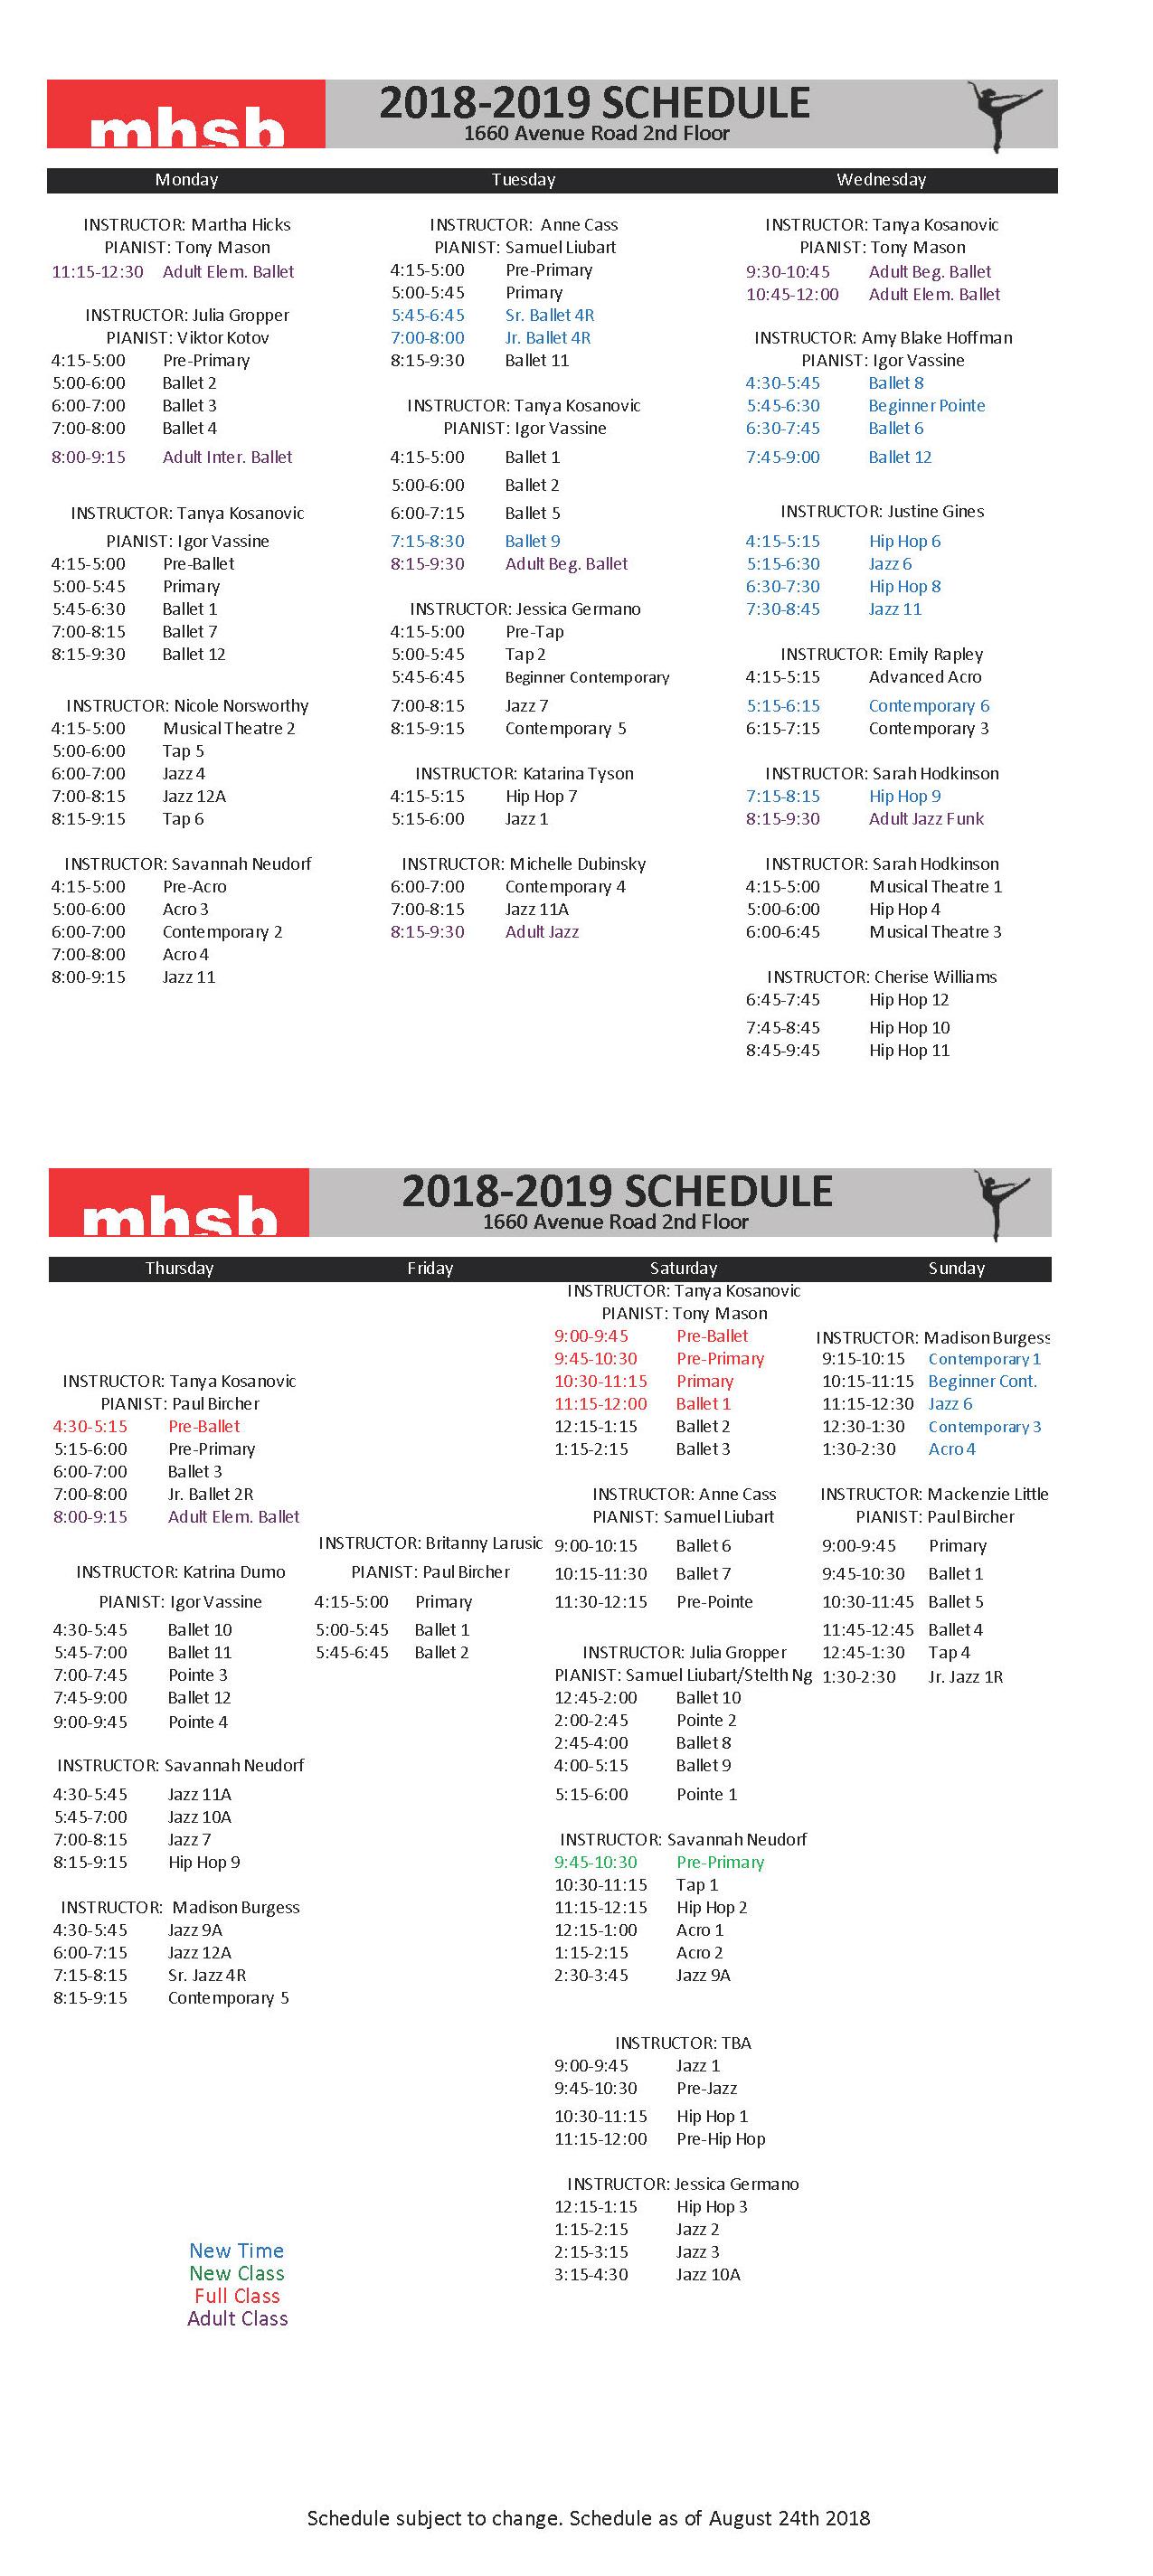 mhsb 2018-19 Schedule.png